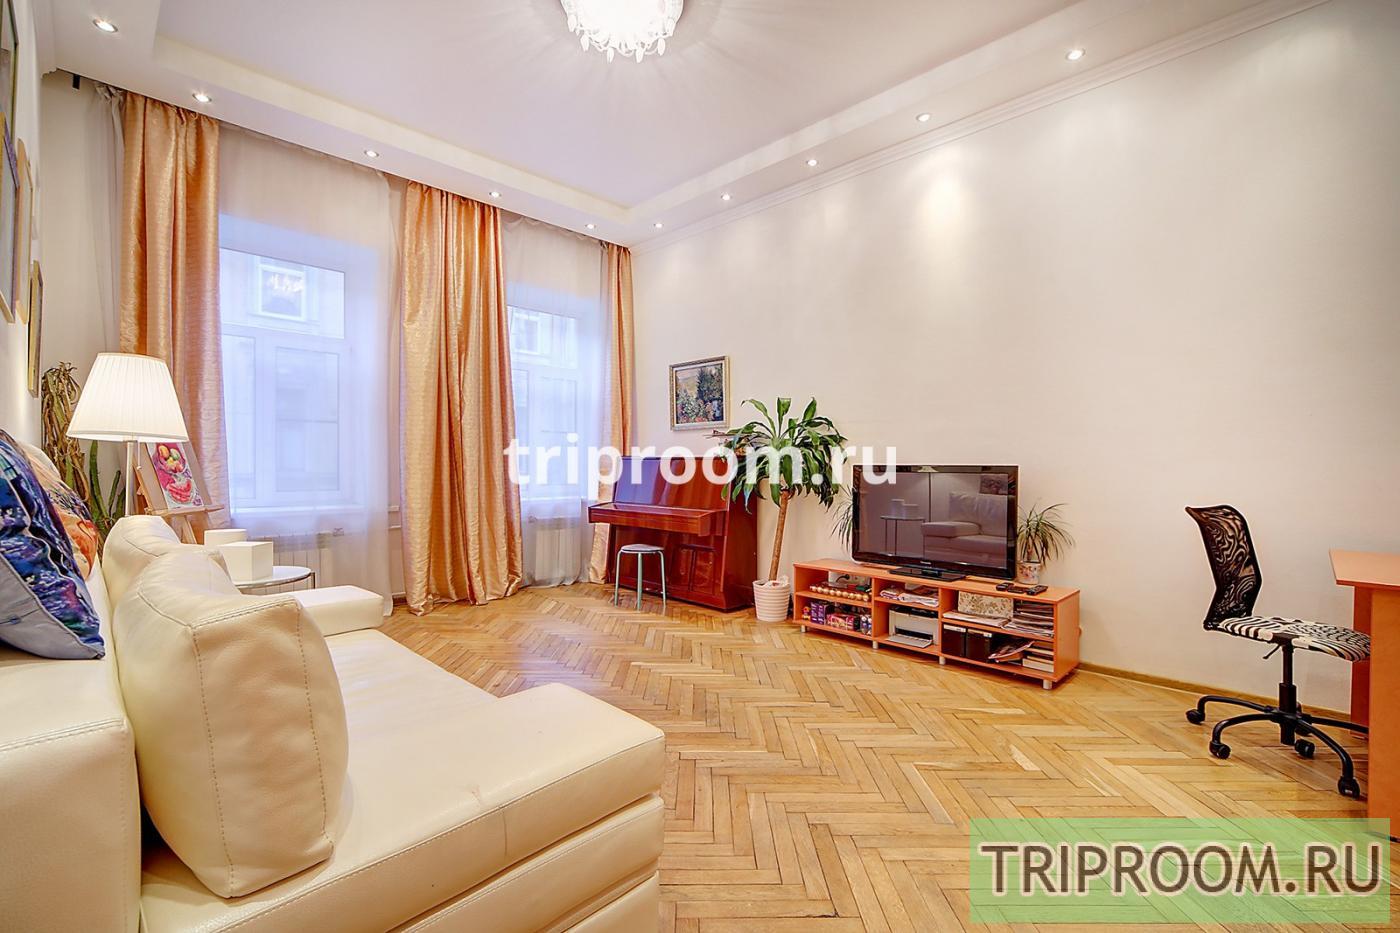 2-комнатная квартира посуточно (вариант № 15426), ул. Лиговский проспект, фото № 2